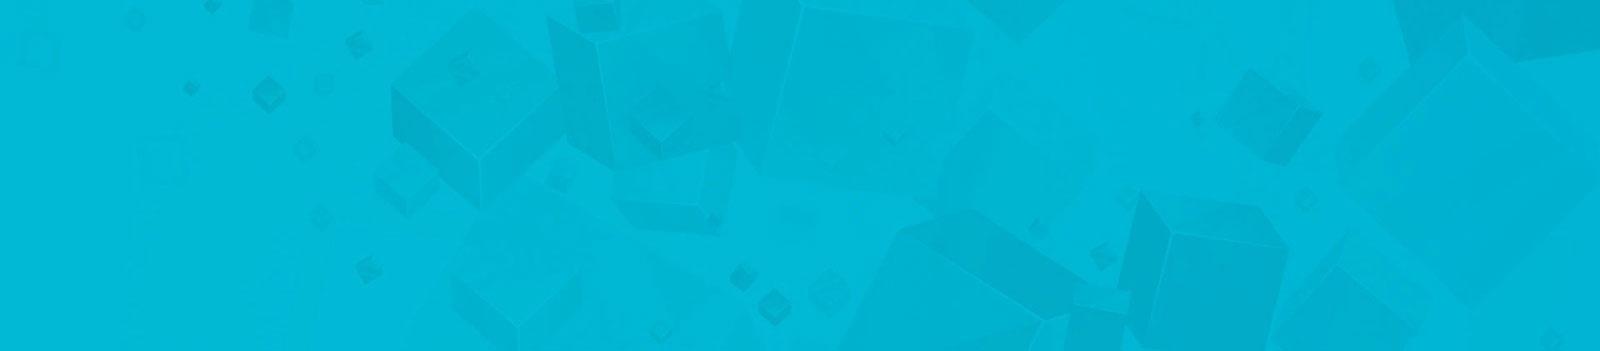 middle-1.jpg